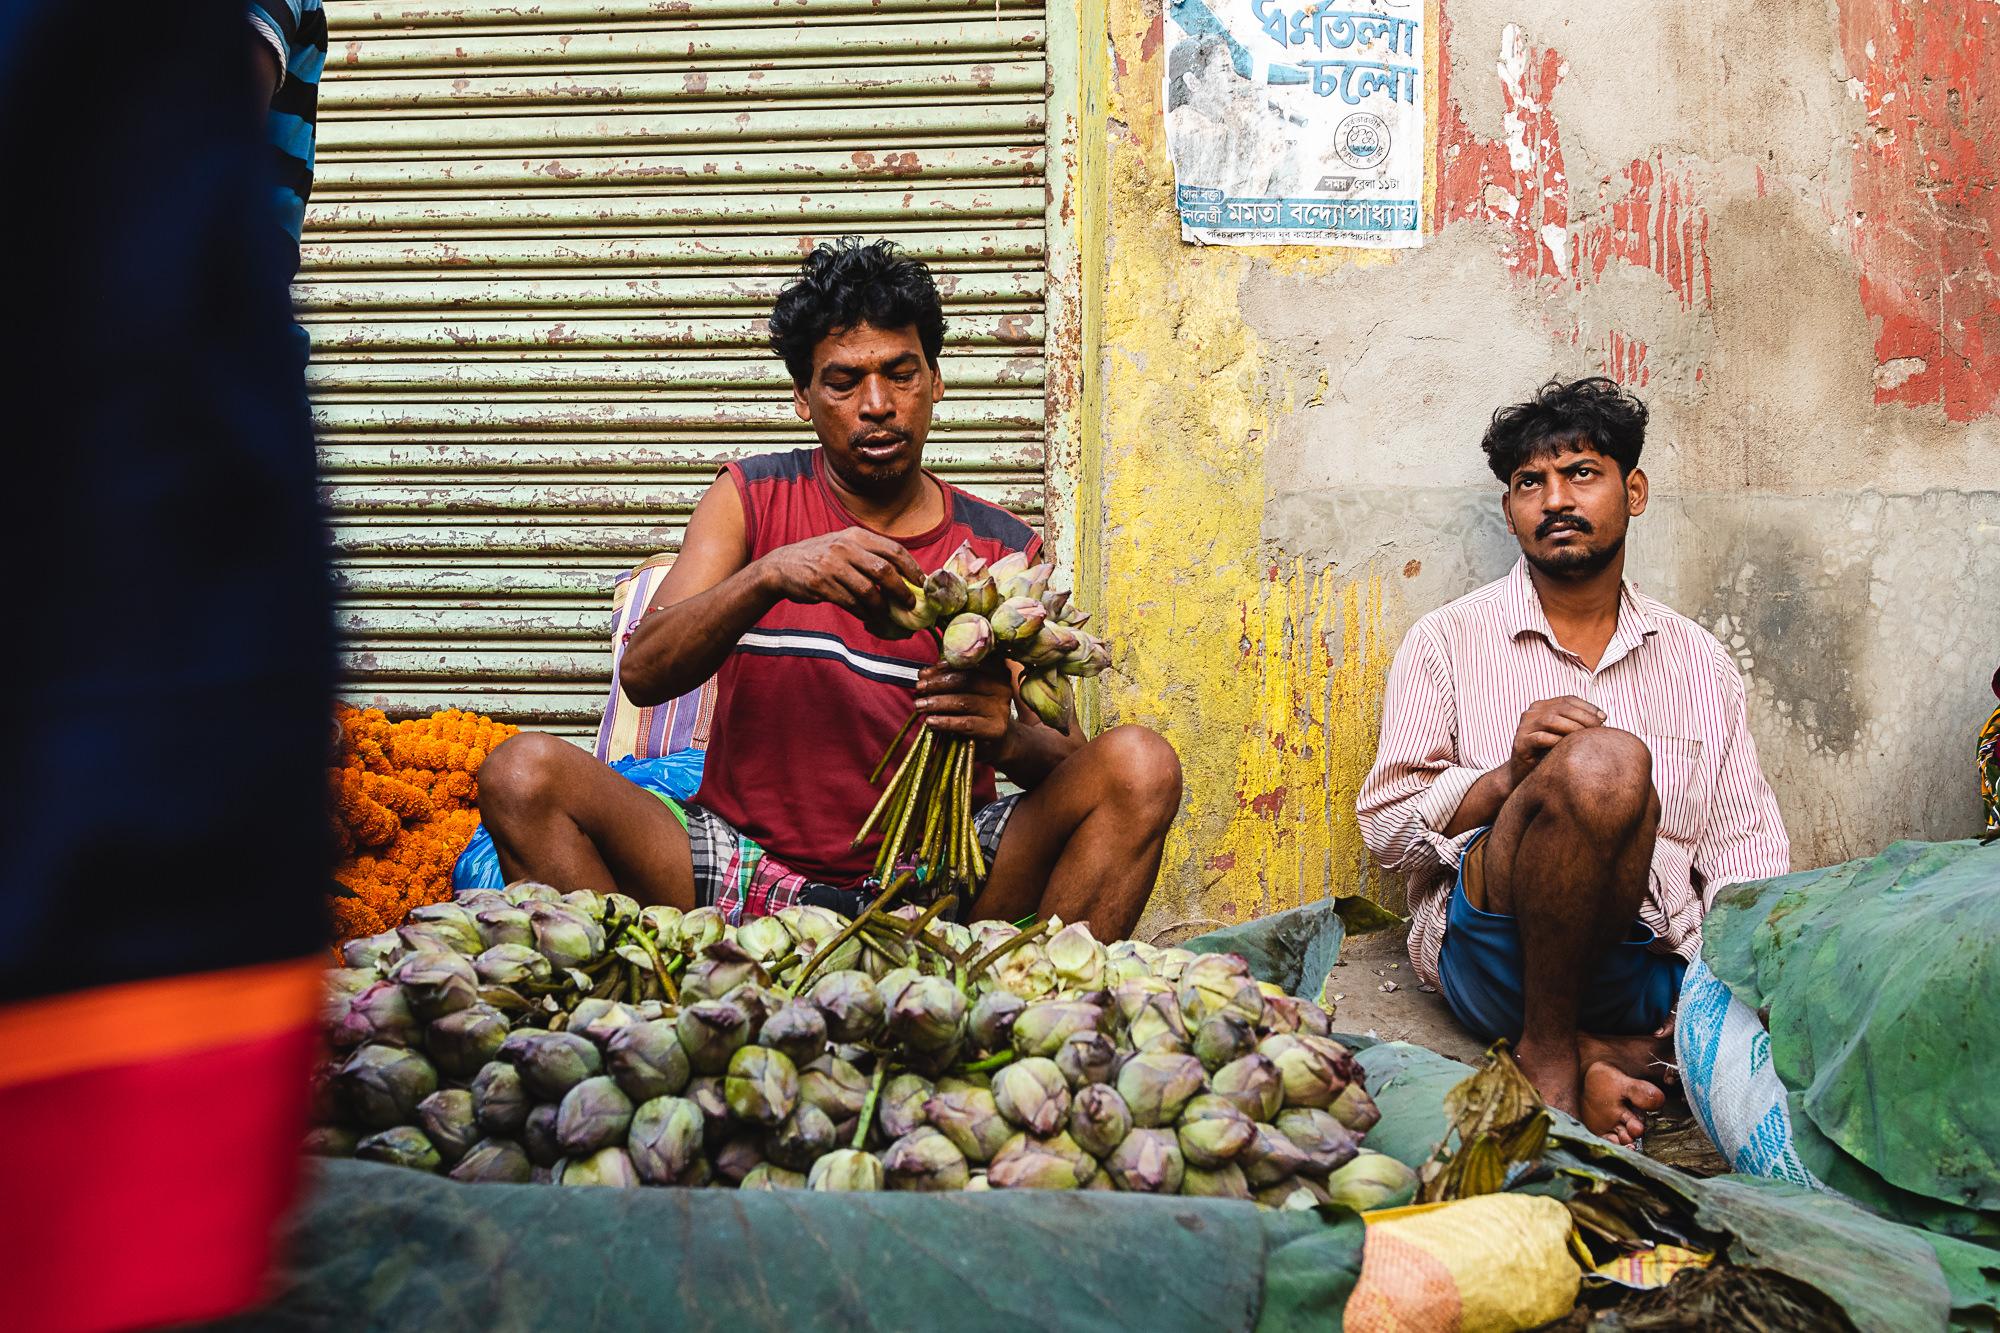 Mallik Ghat Flower Market - vendor selling lotus